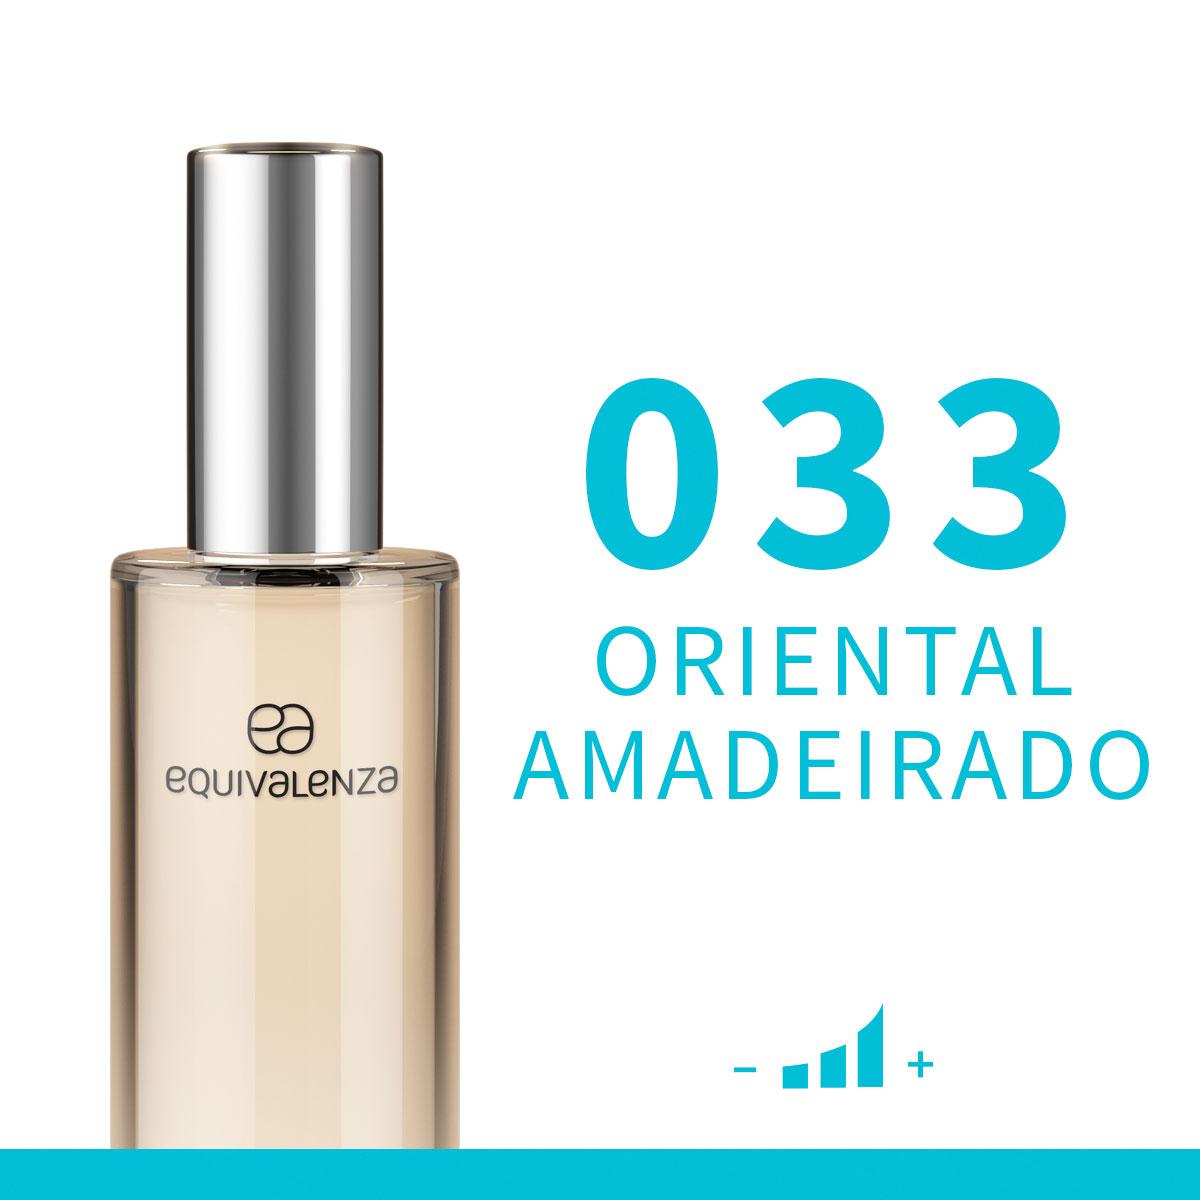 Oriental Amadeirado 033